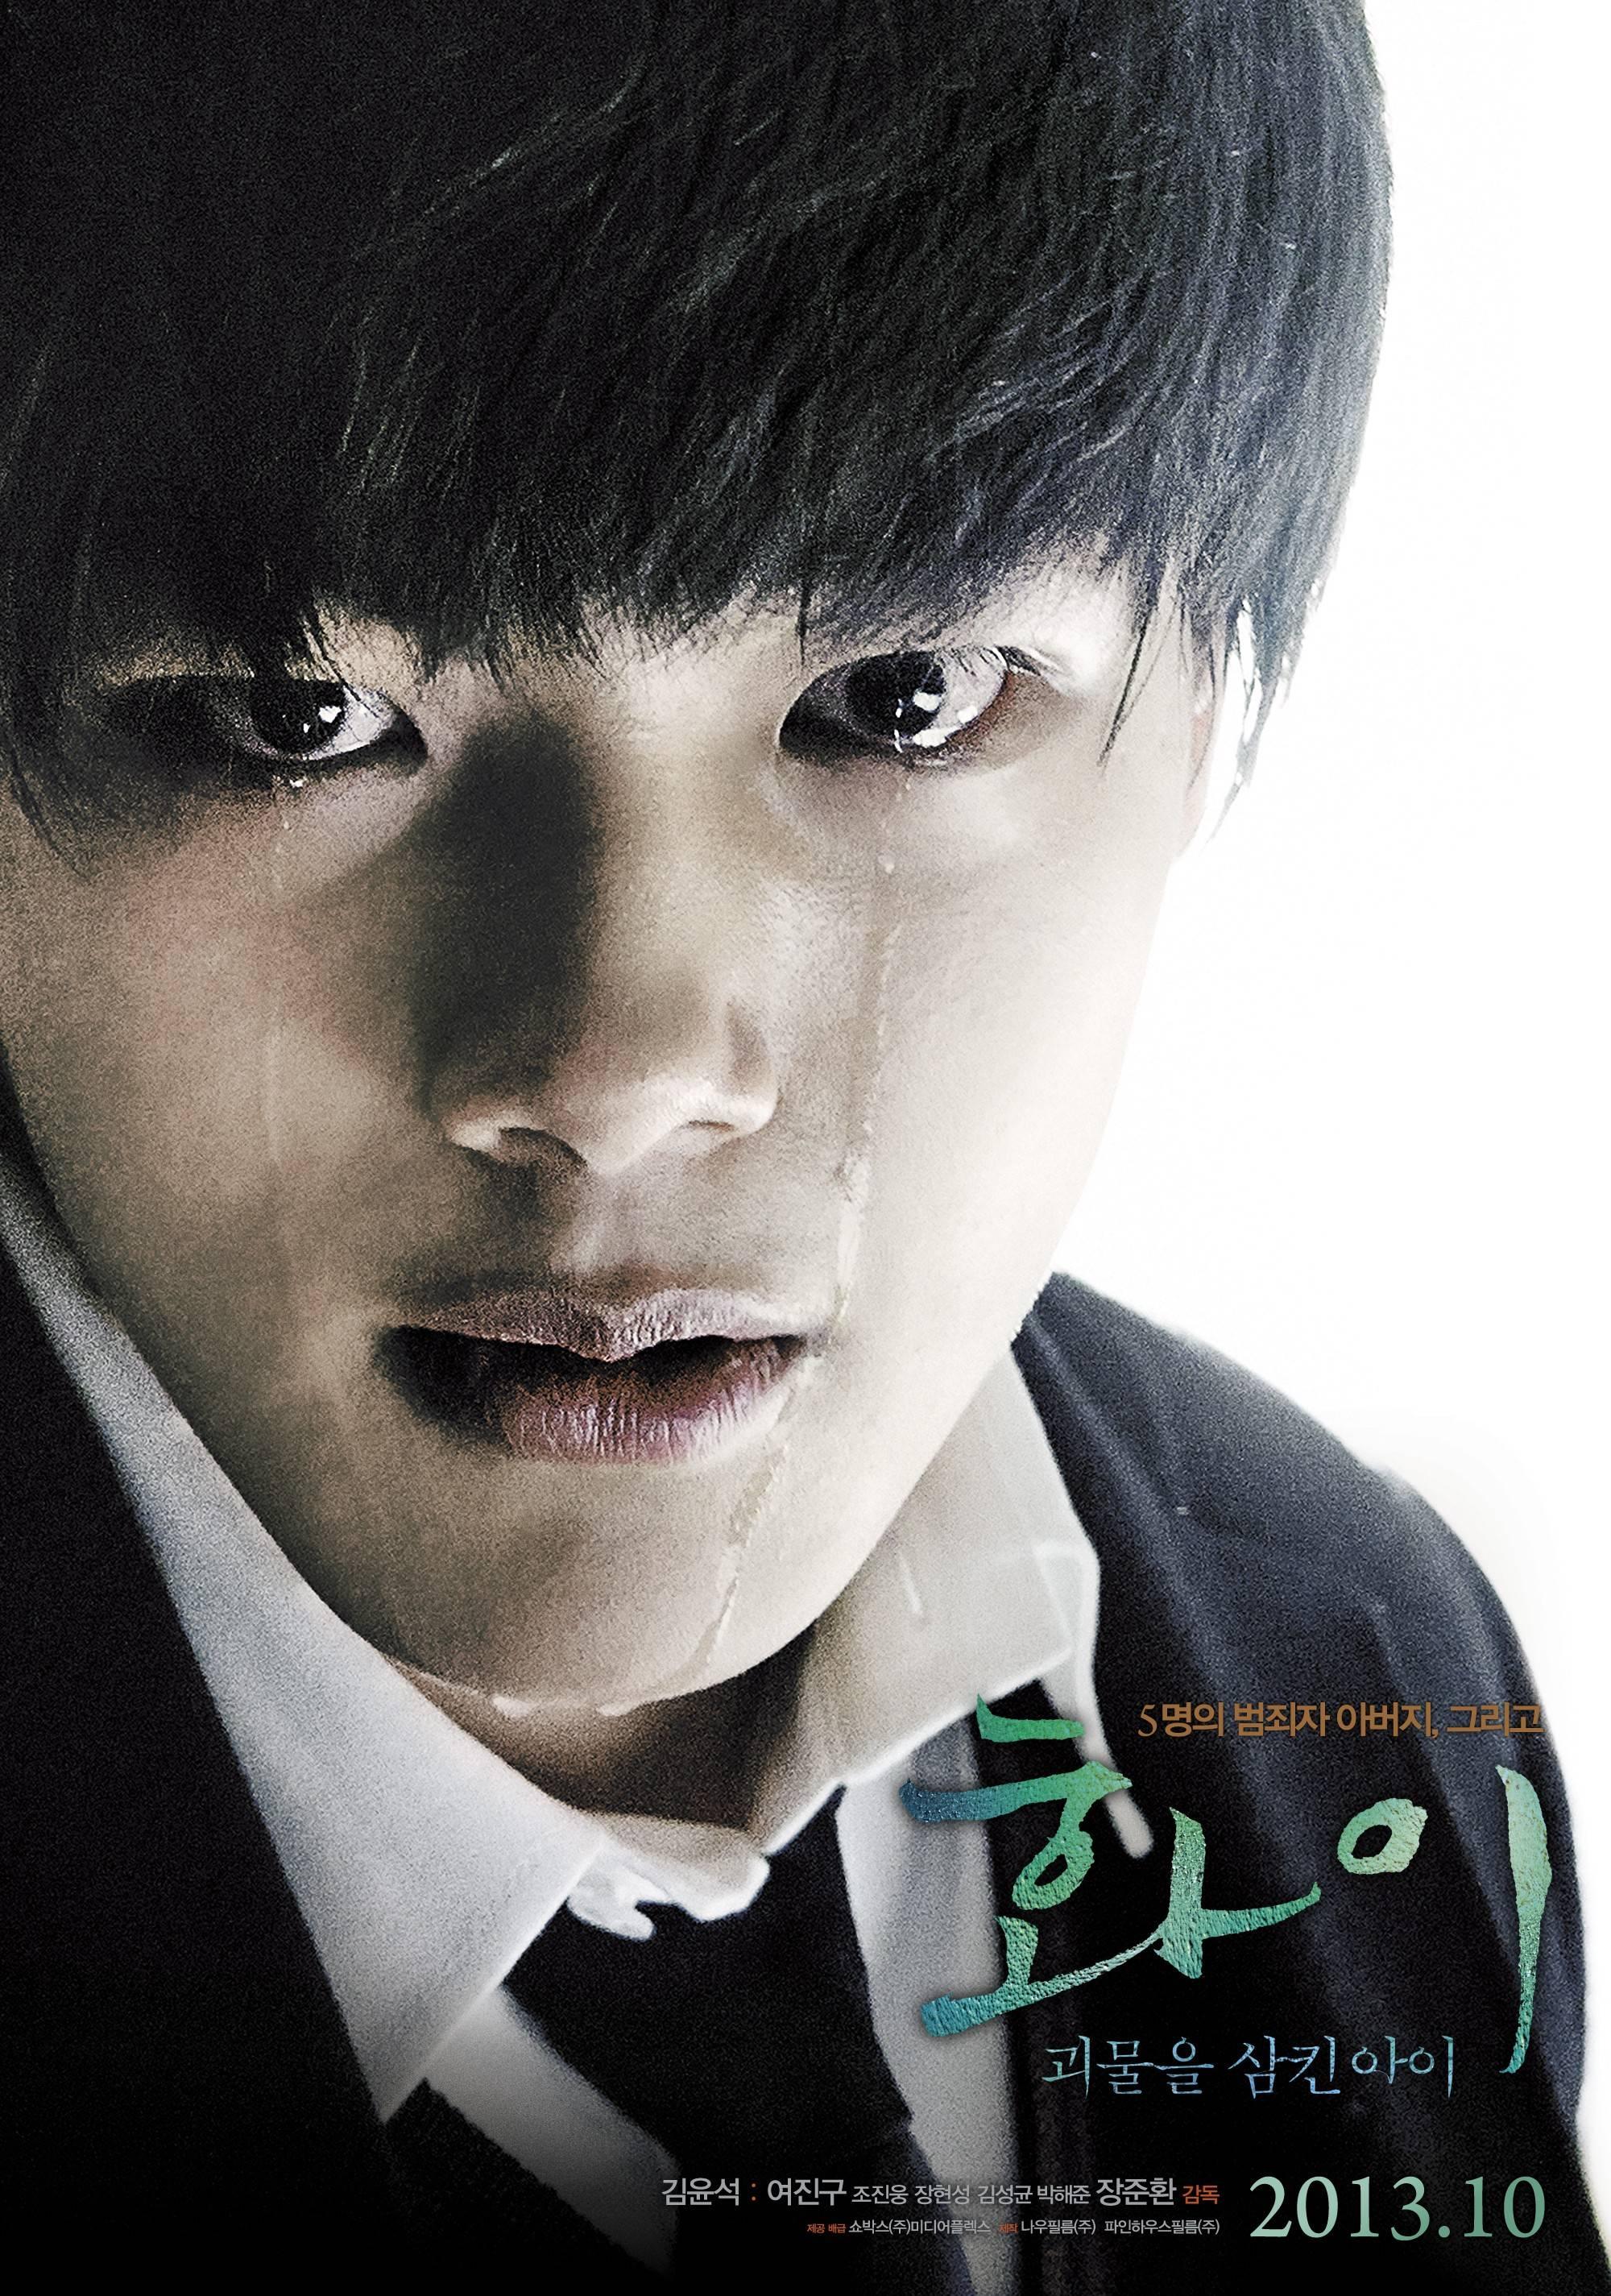 hwayi a monster boy 2013 full movie eng sub